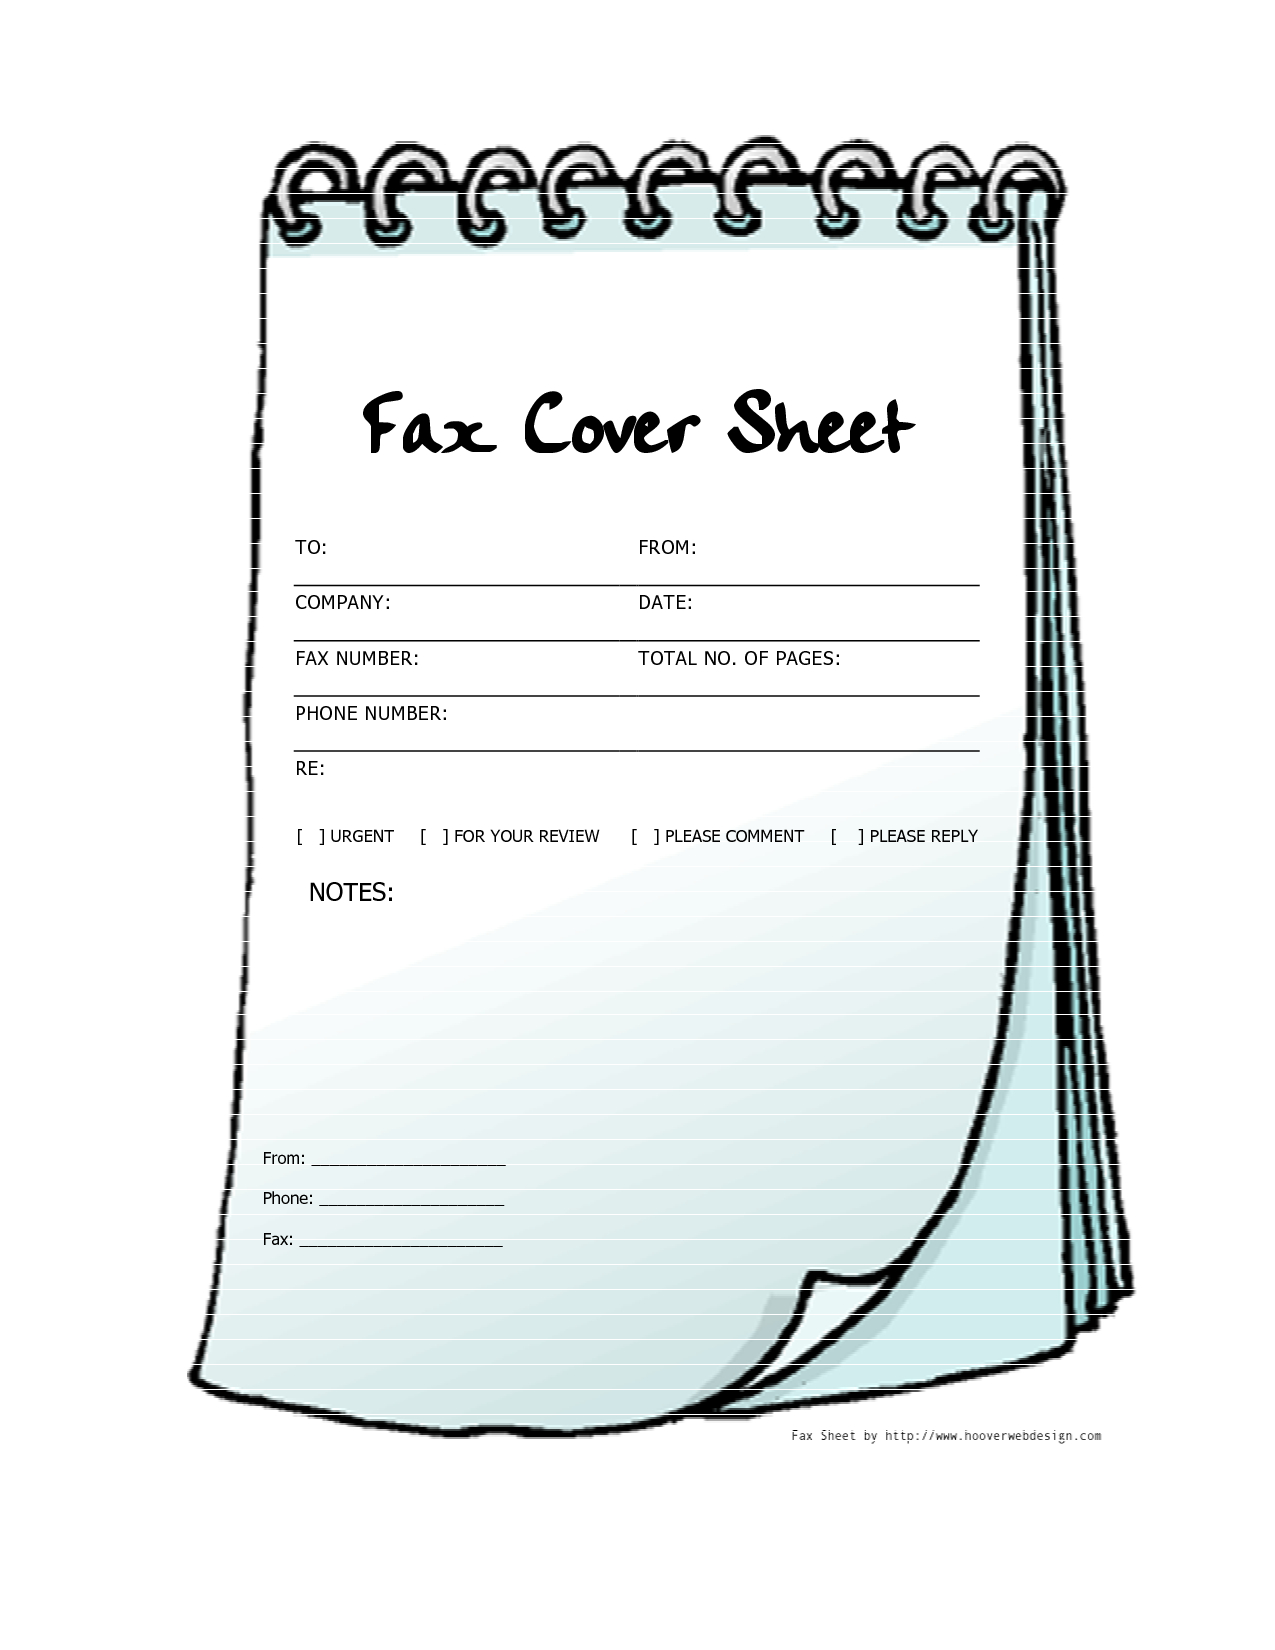 Free Printable Fax Cover Sheets | Free Printable Fax Cover Sheet - Free Printable Fax Cover Page